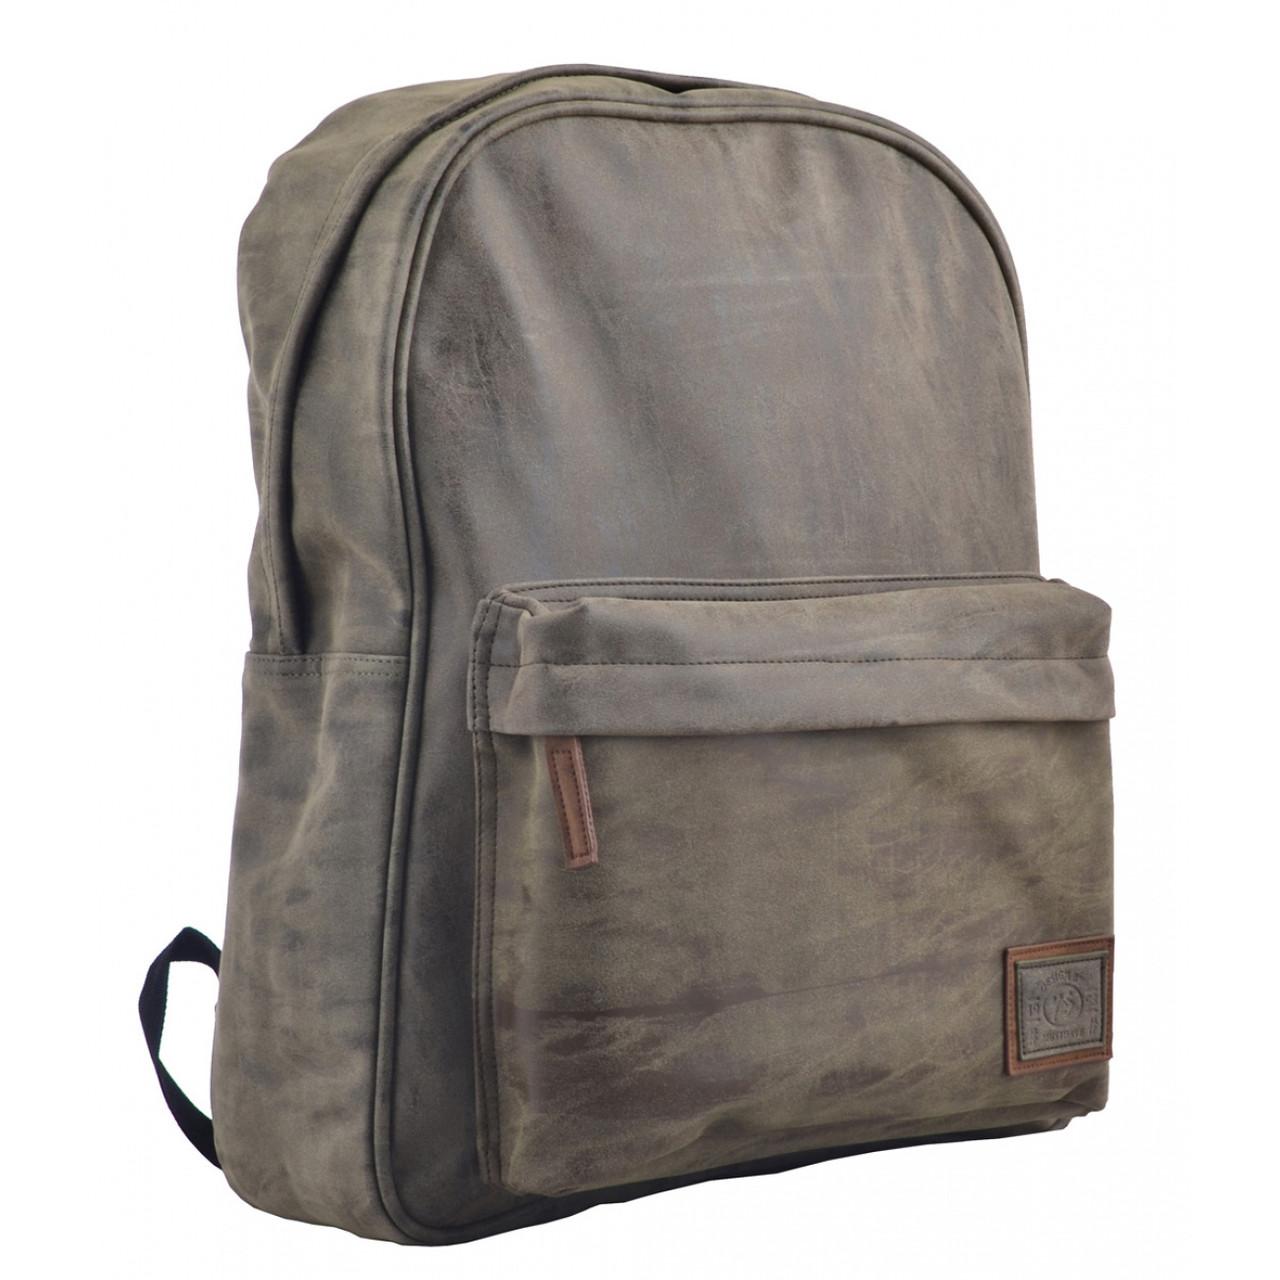 Рюкзак молодежный YES ST-16 Infinity wet stone, 42*31*13 555052